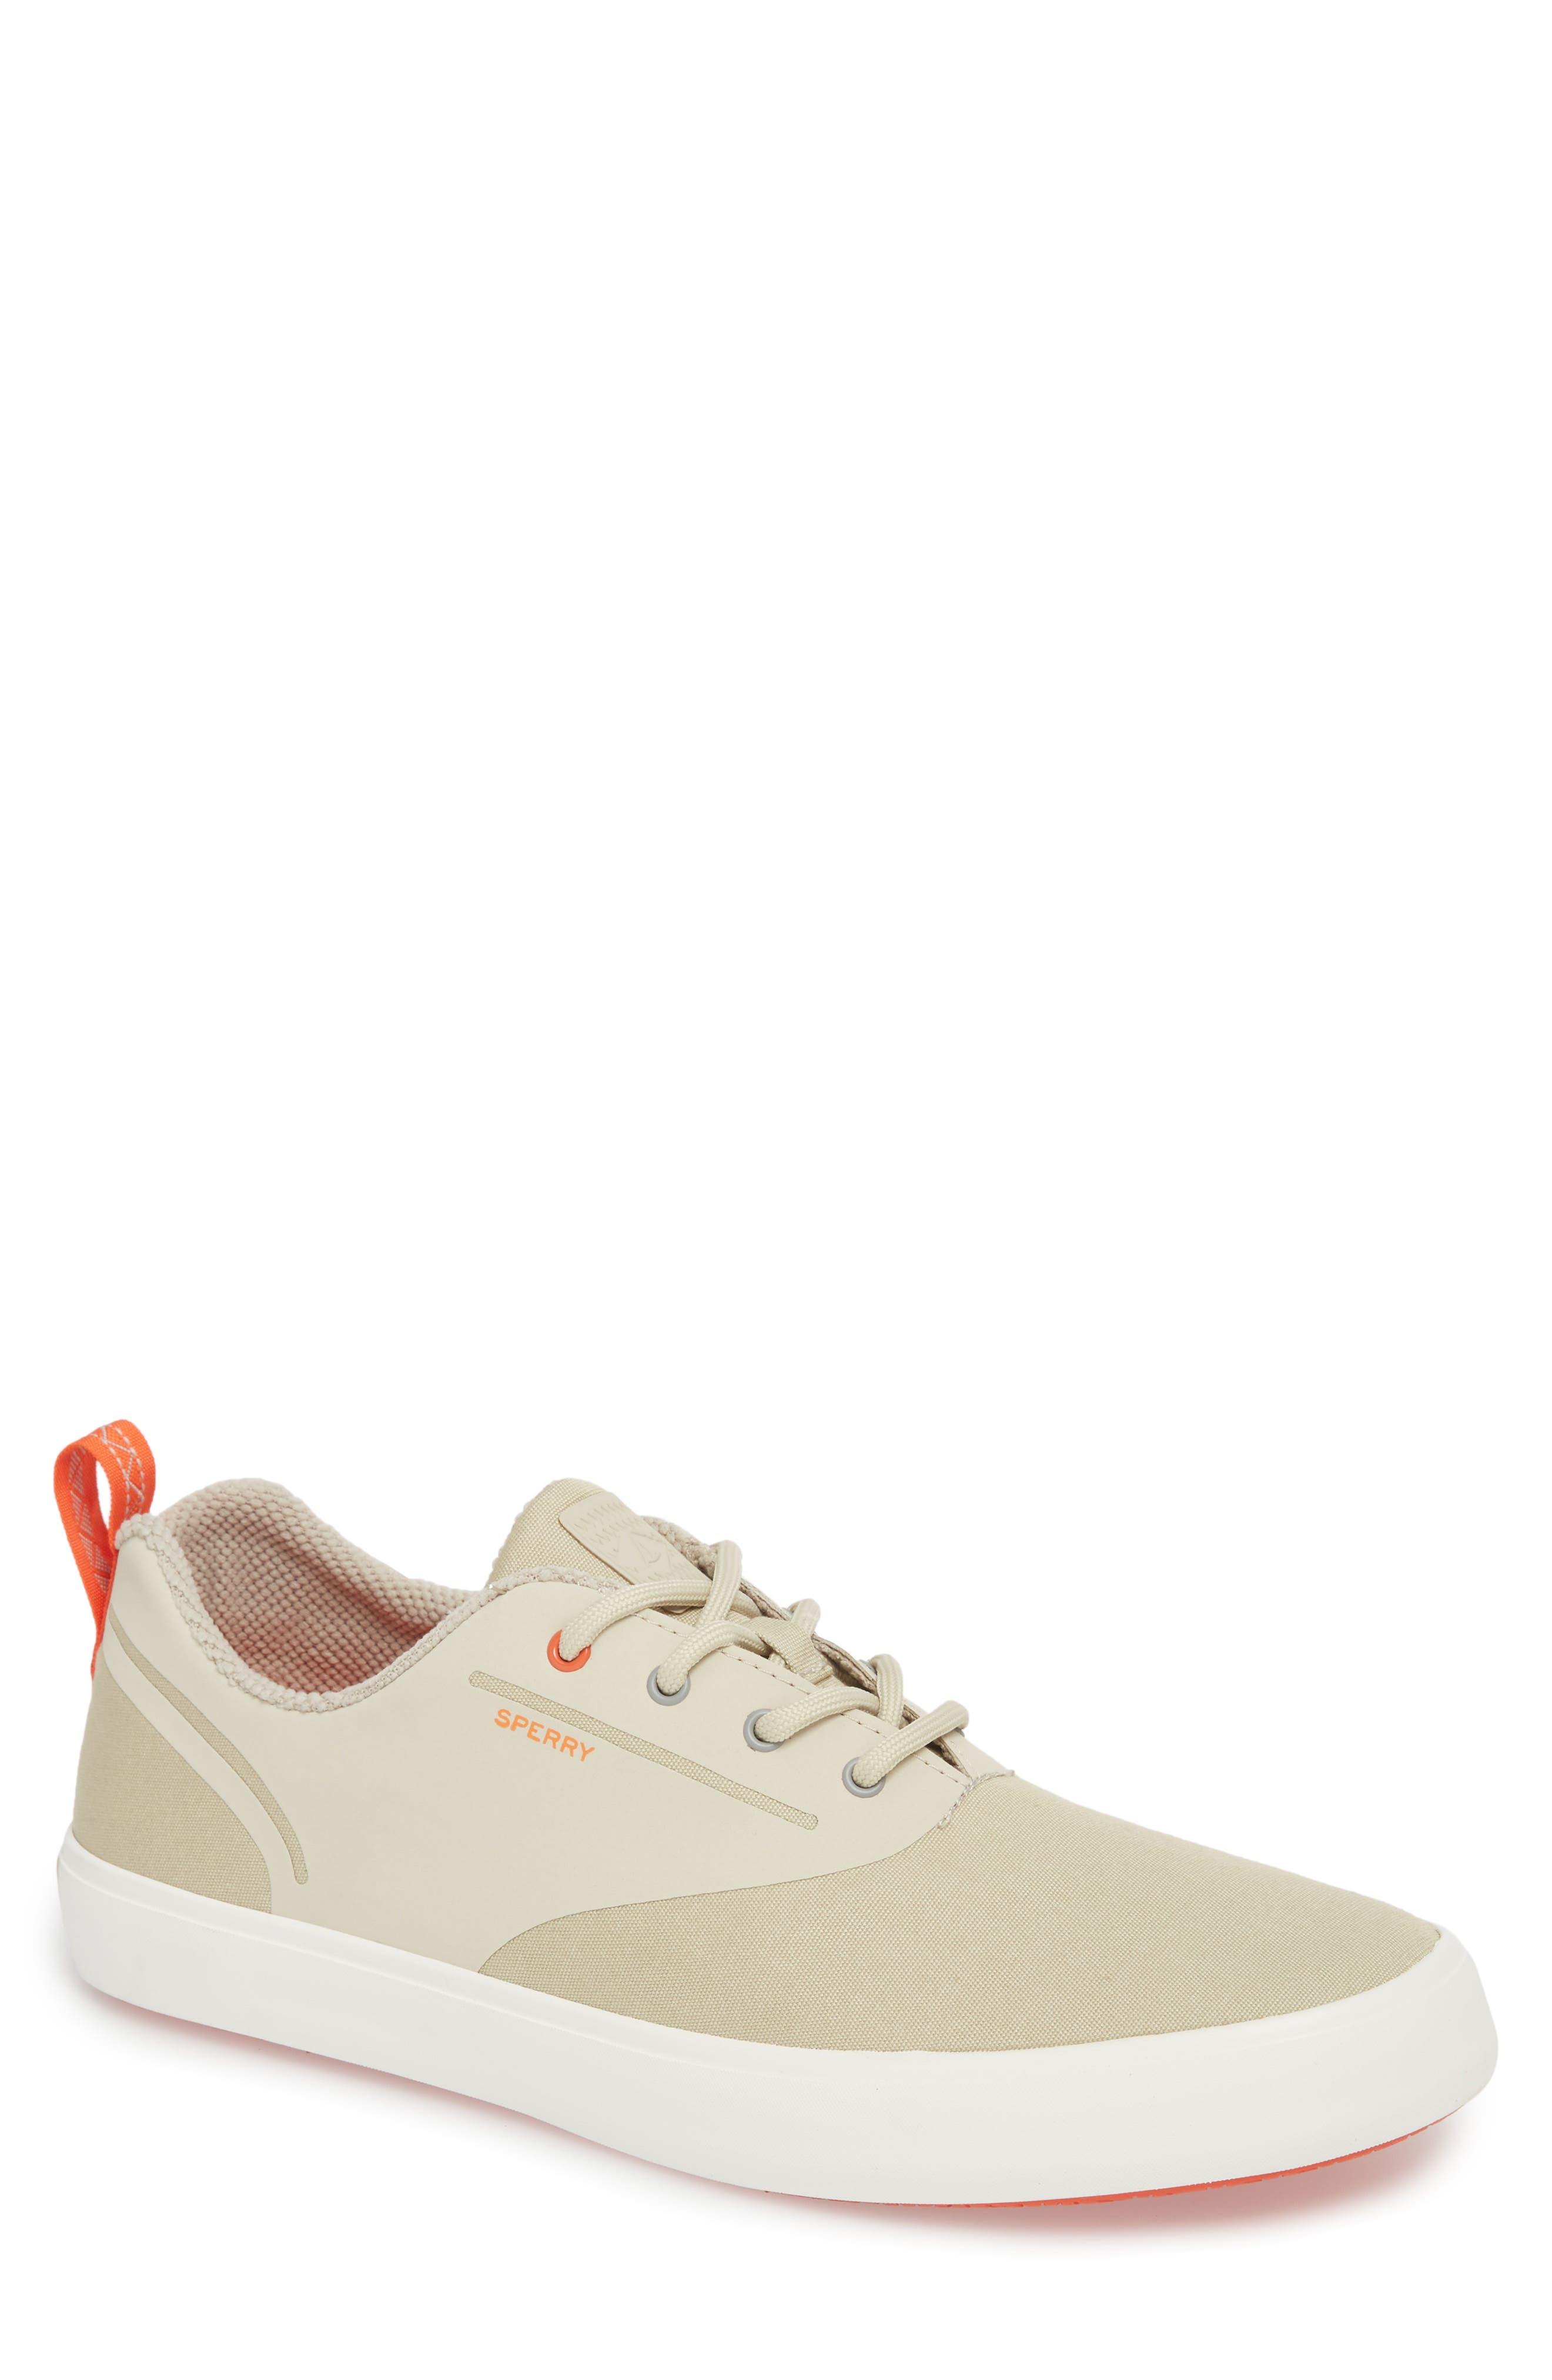 Flex Deck CVO Sneaker,                         Main,                         color, BEIGE